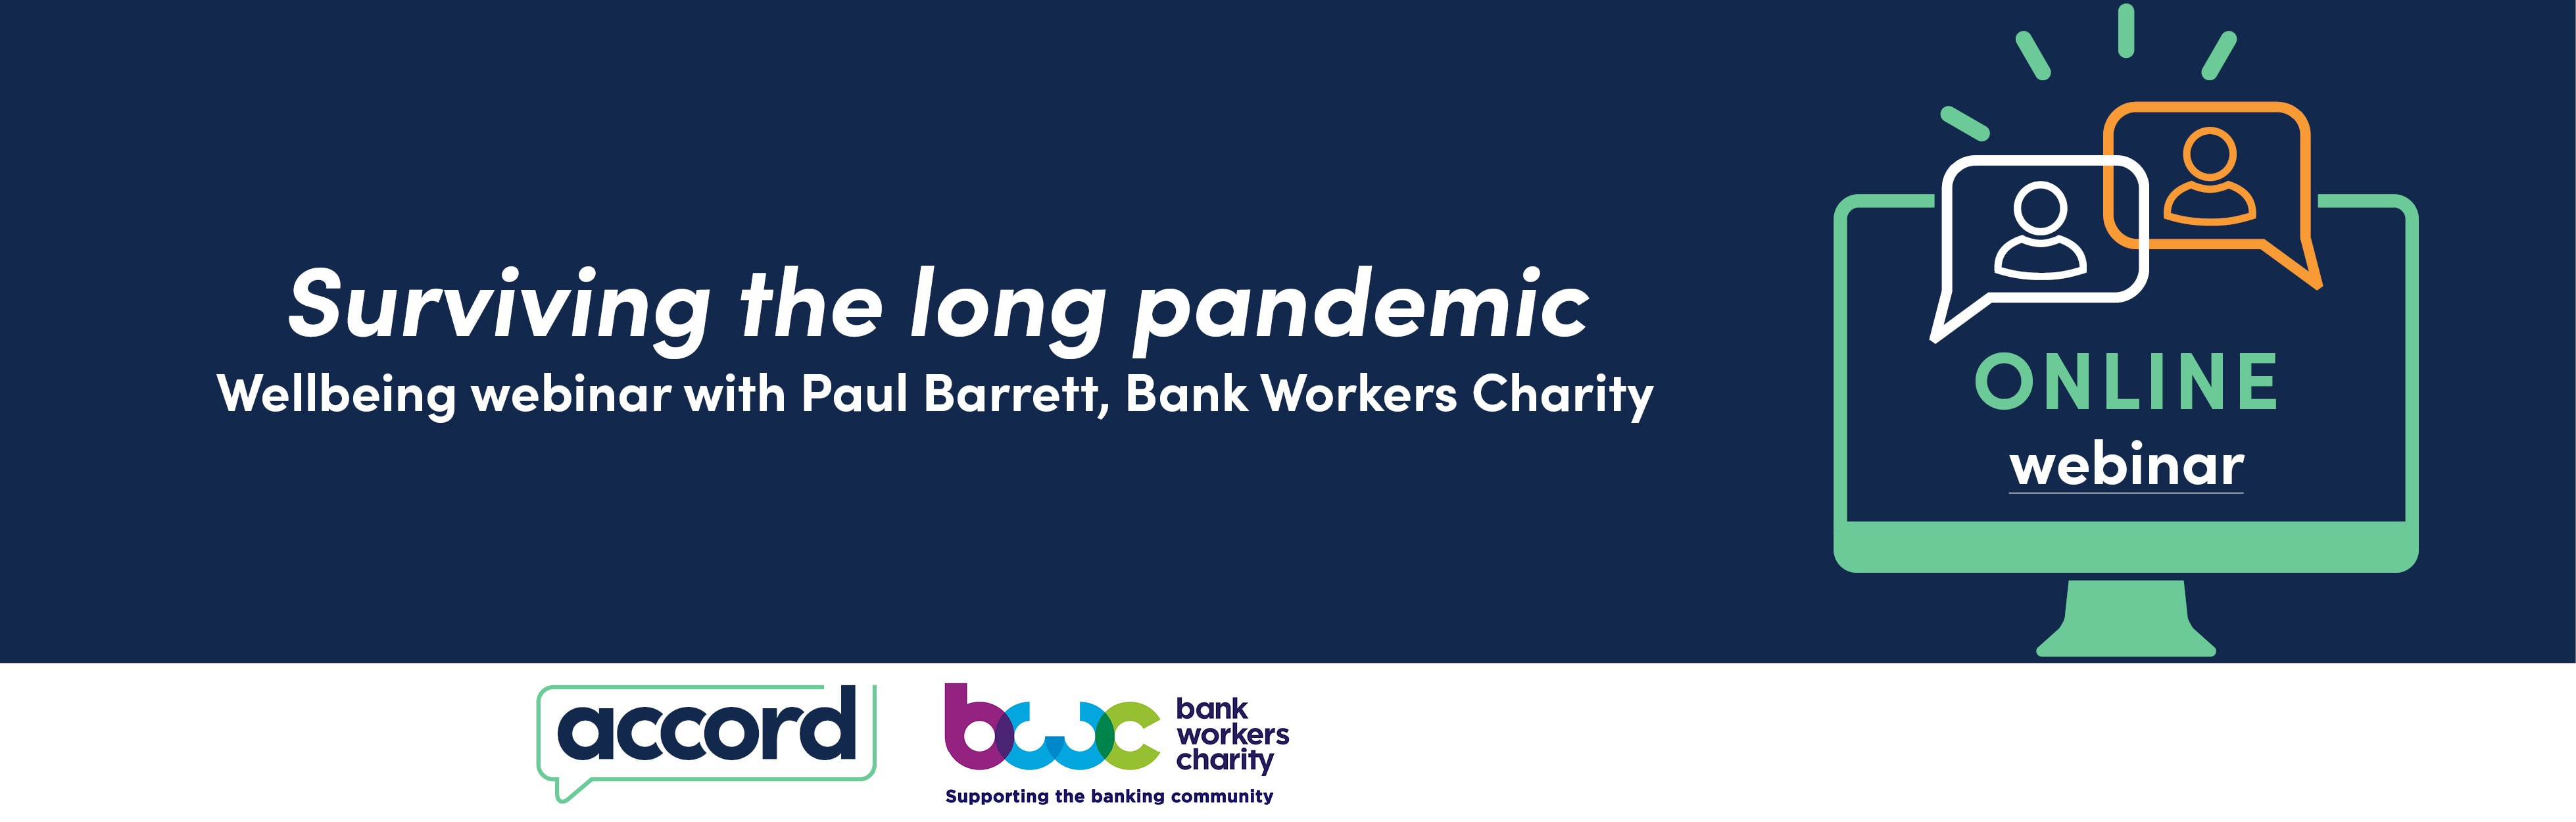 Surviving the long pandemic header image